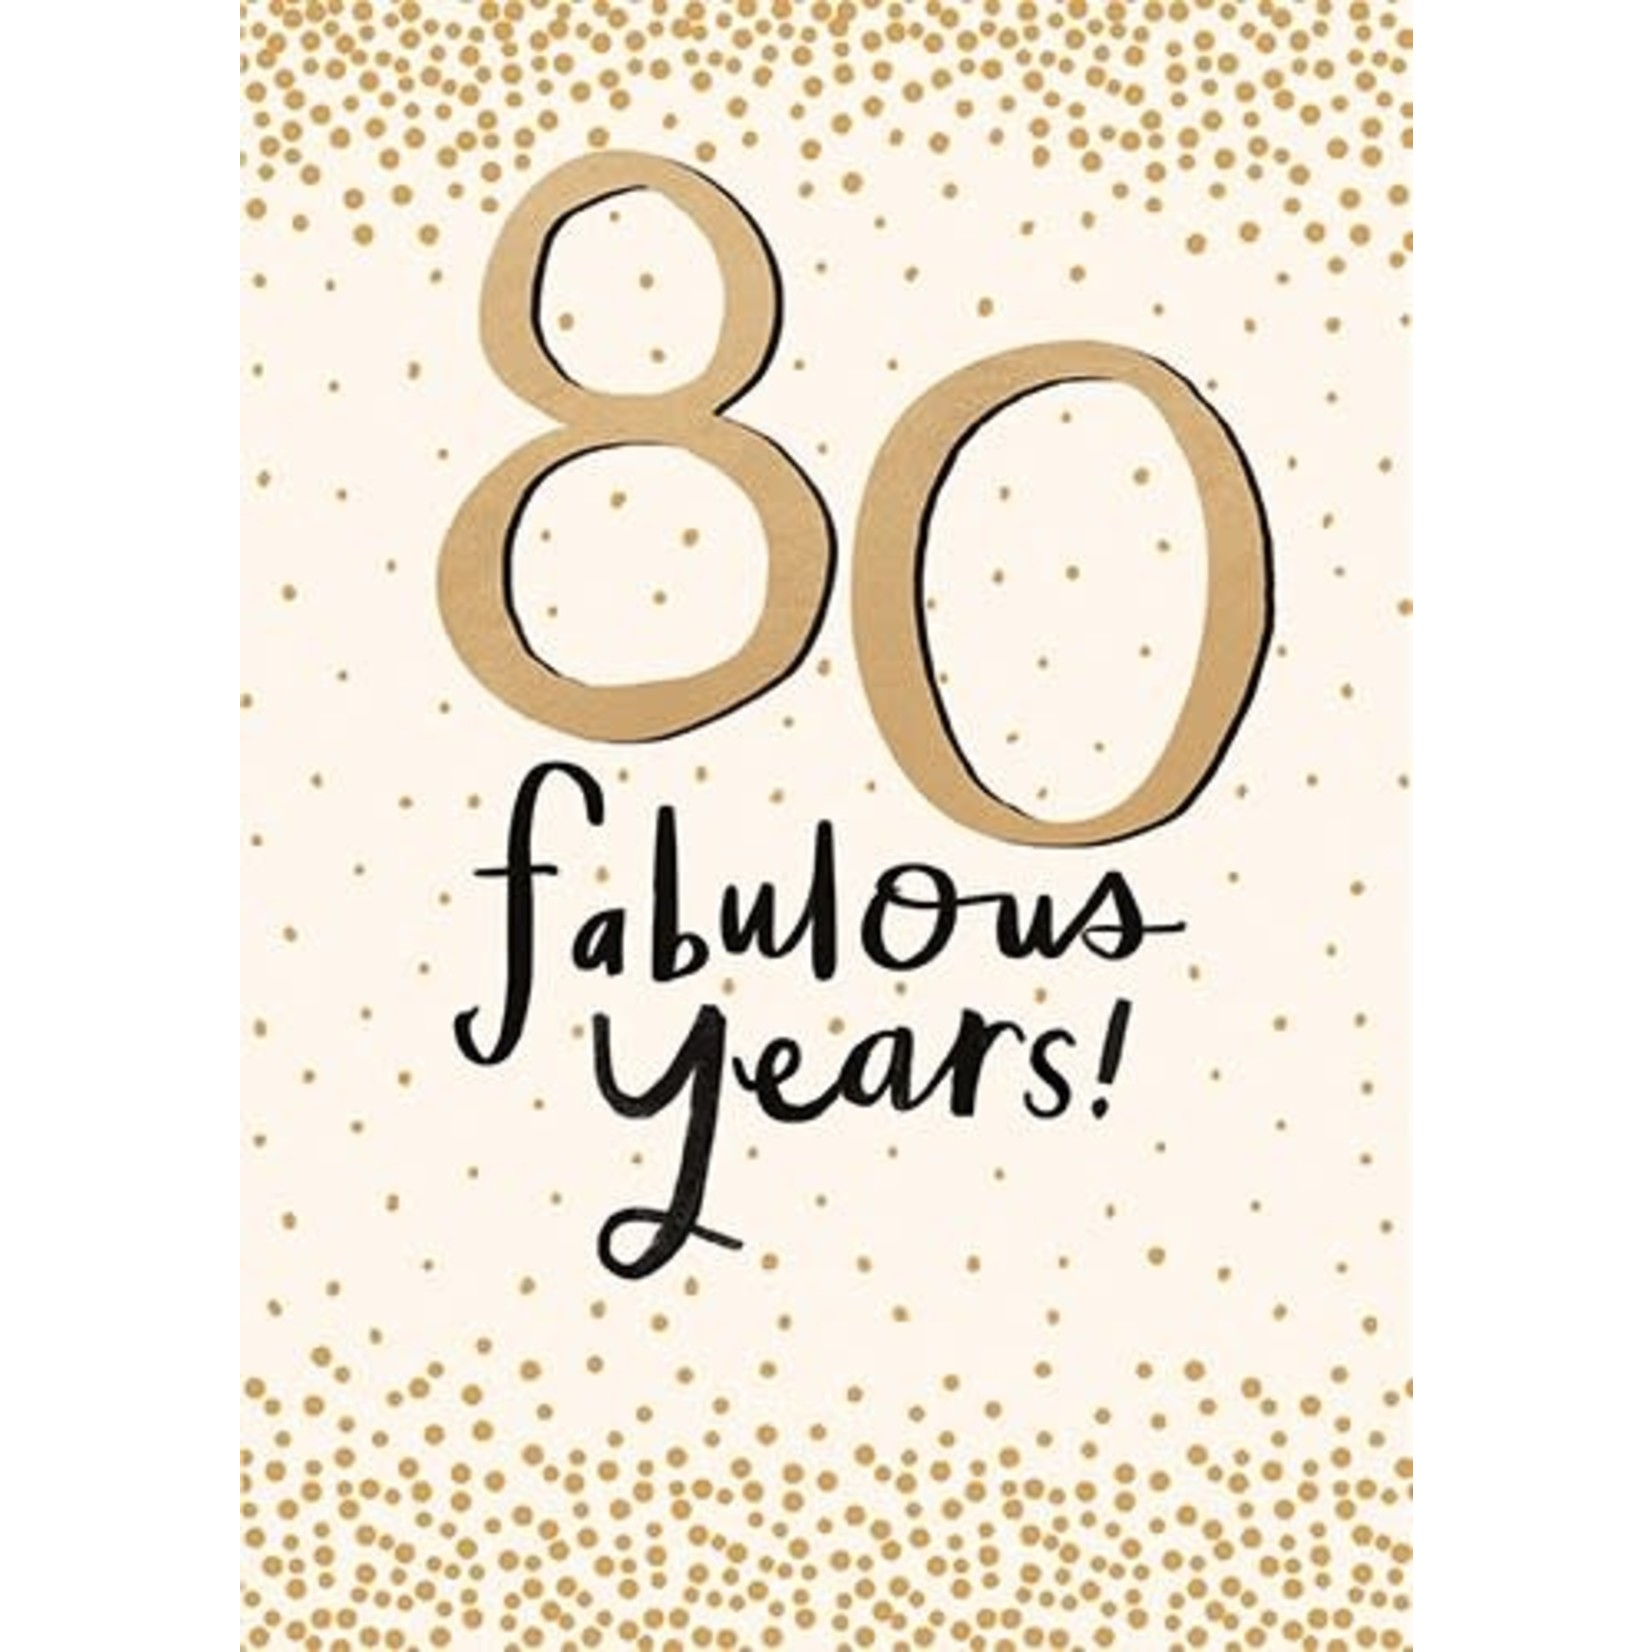 80 FABULOUS YEARS